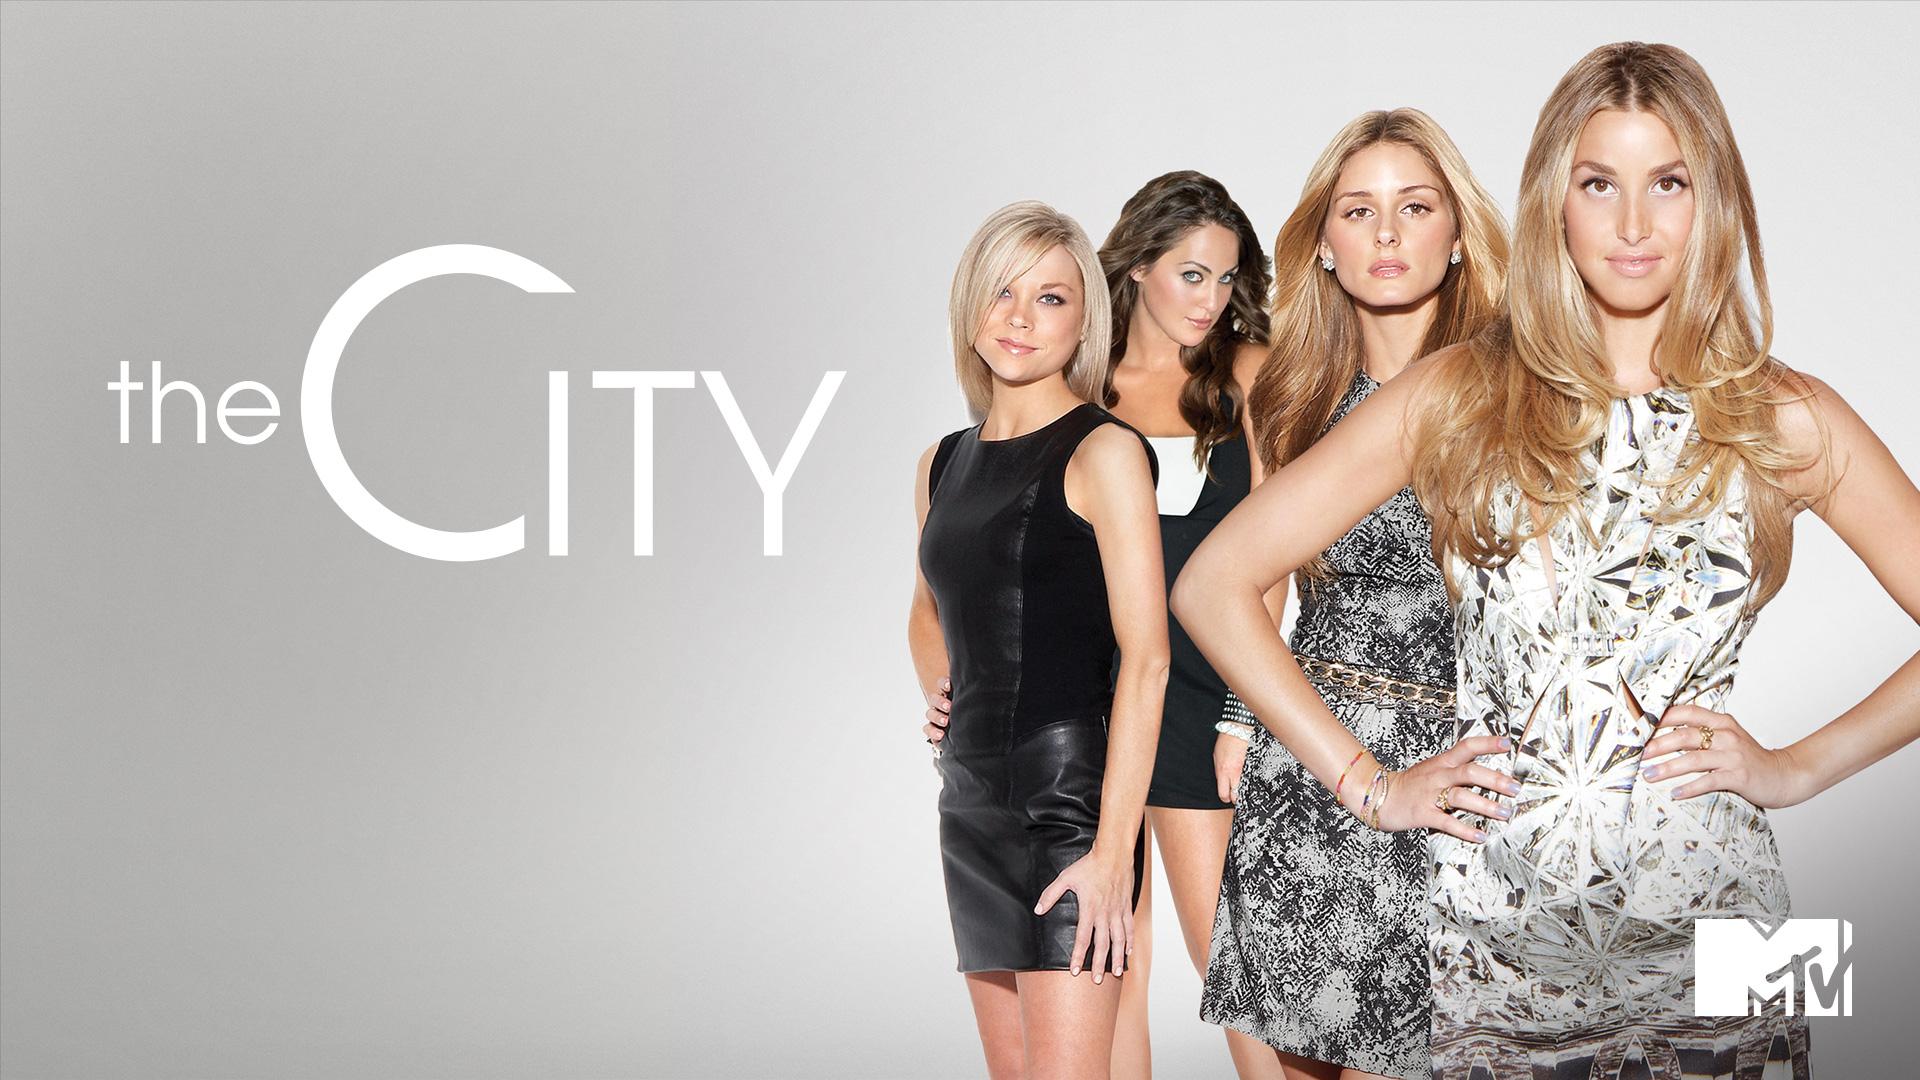 The City Season 1